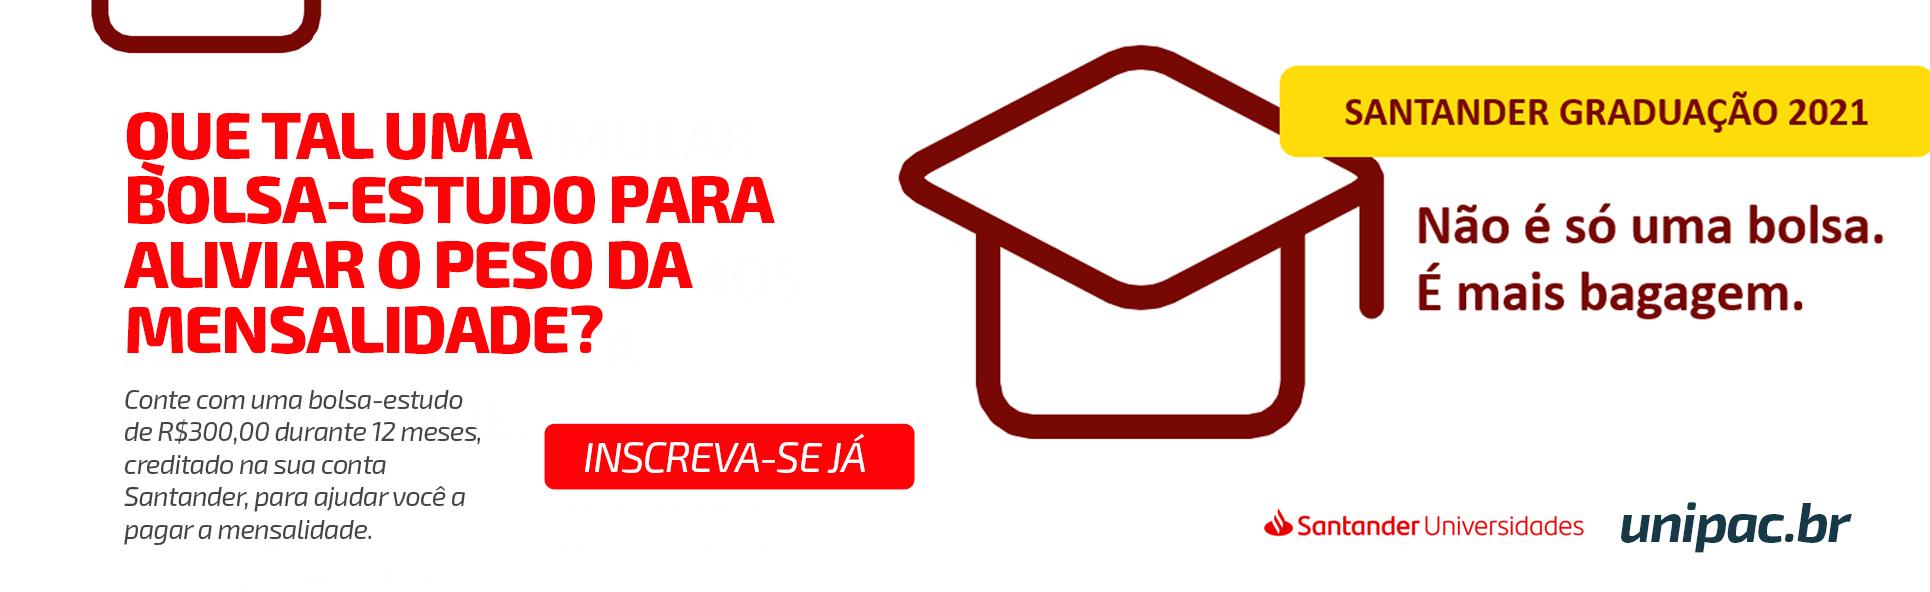 Santander Universidades – desktop 22/03/21